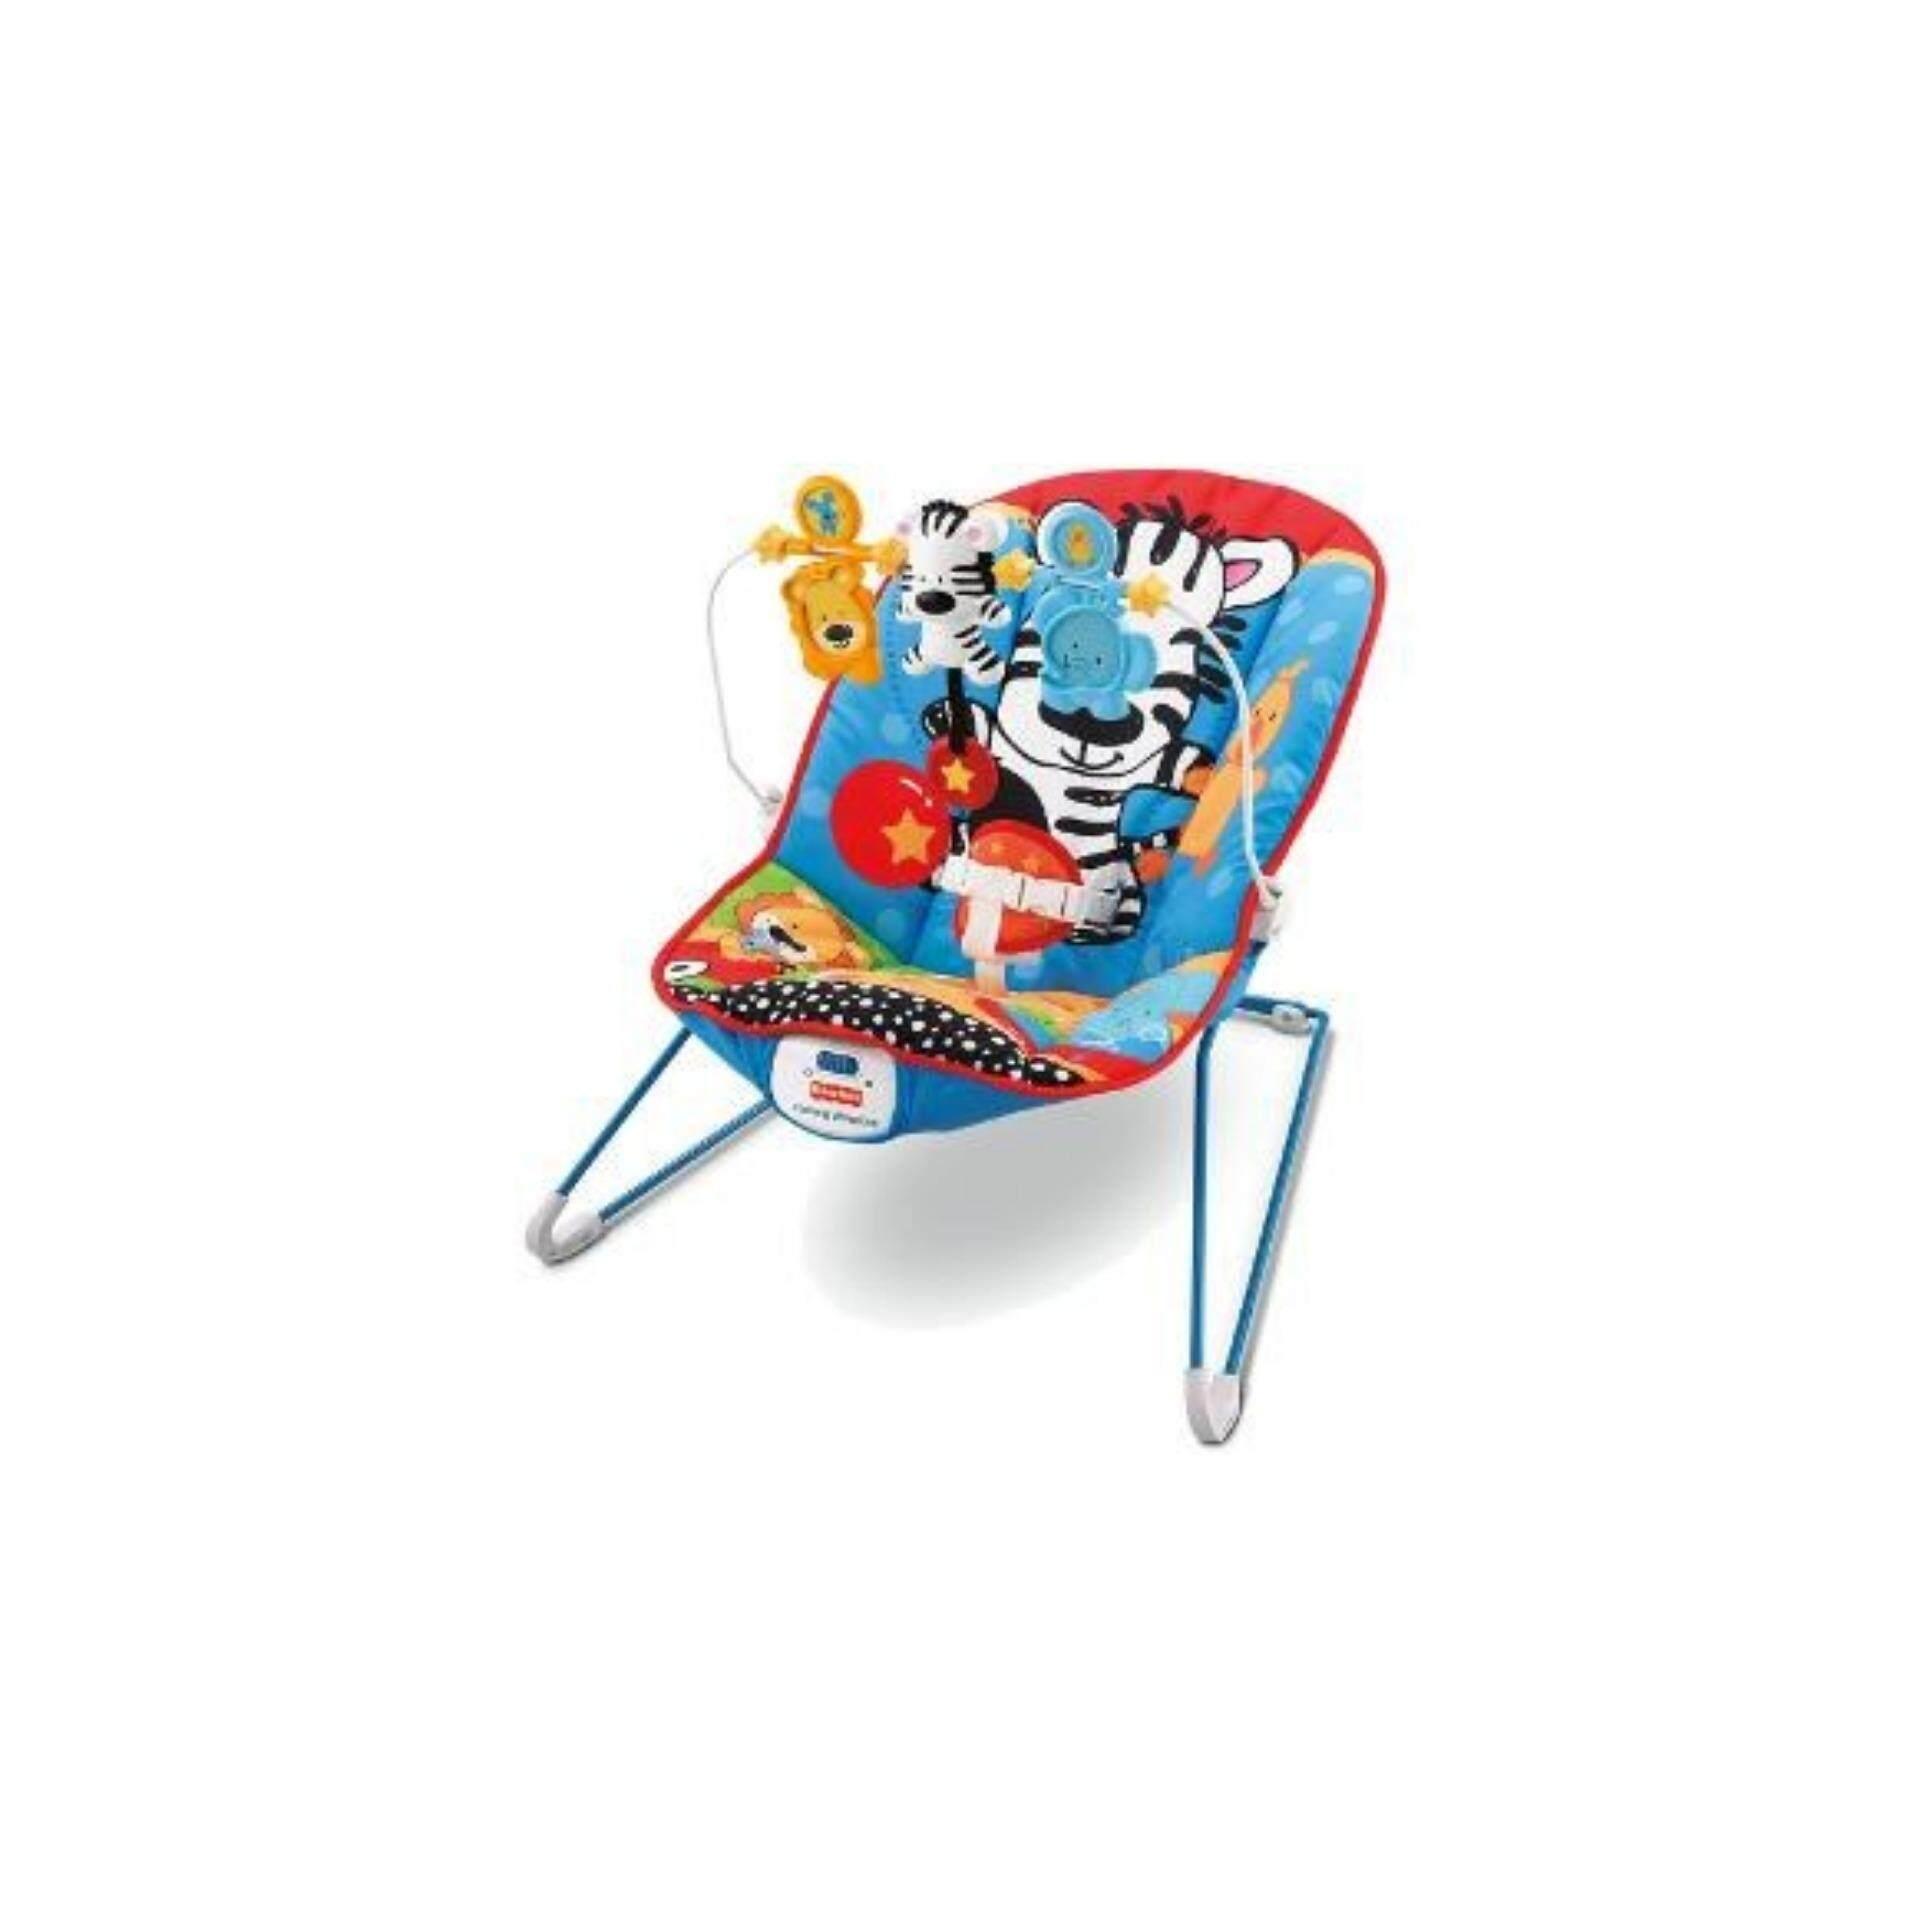 ZEBRA BOUNCER BABY - BLUE